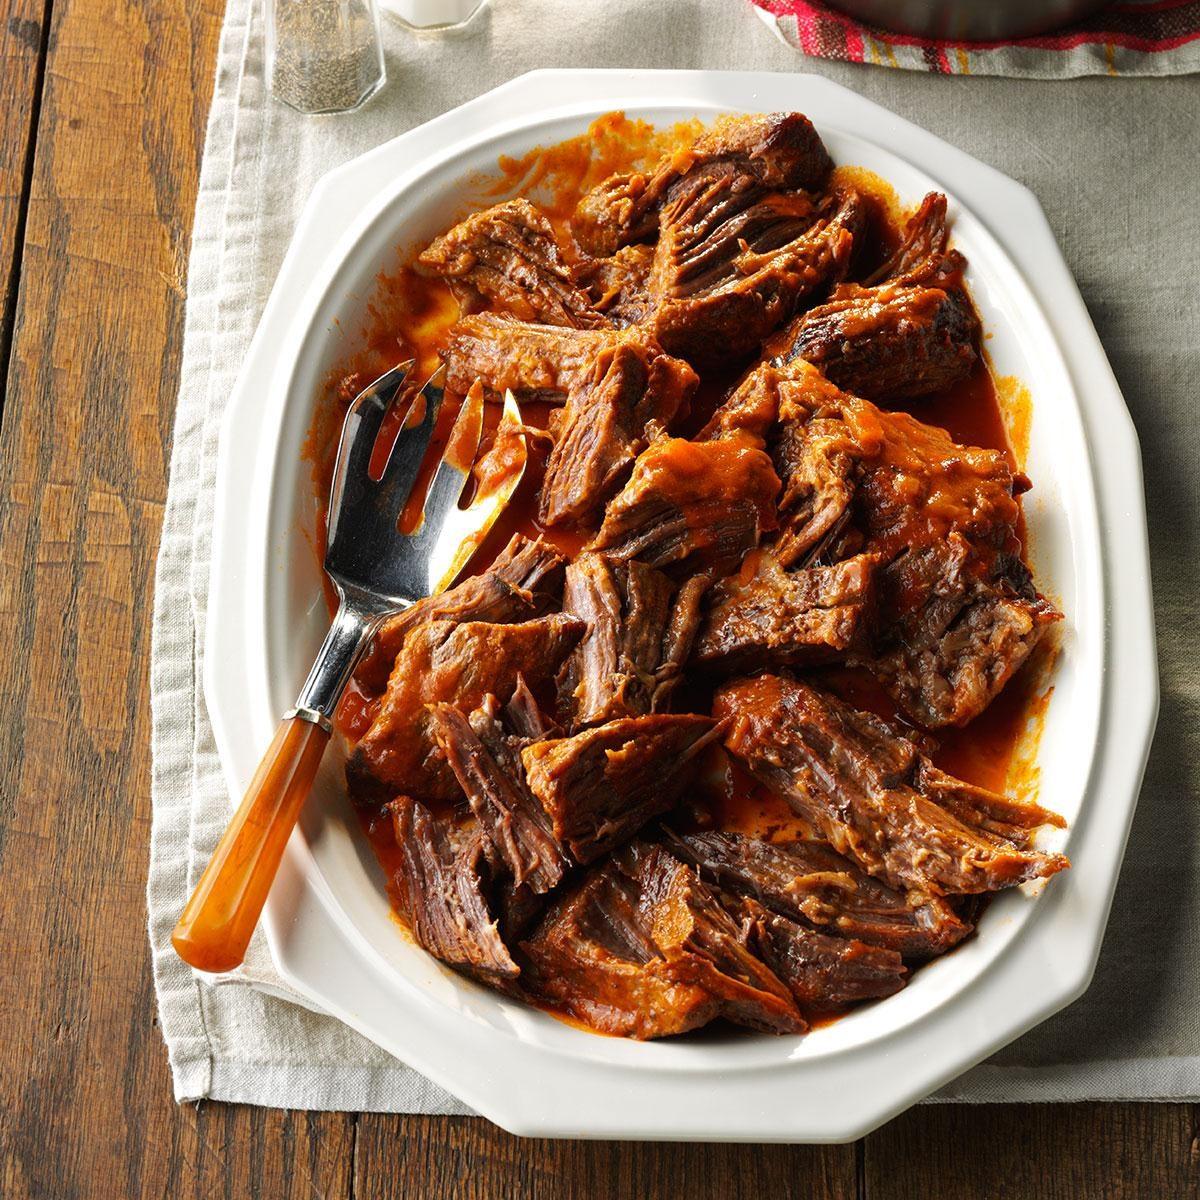 Sunday: Bavarian Pot Roast